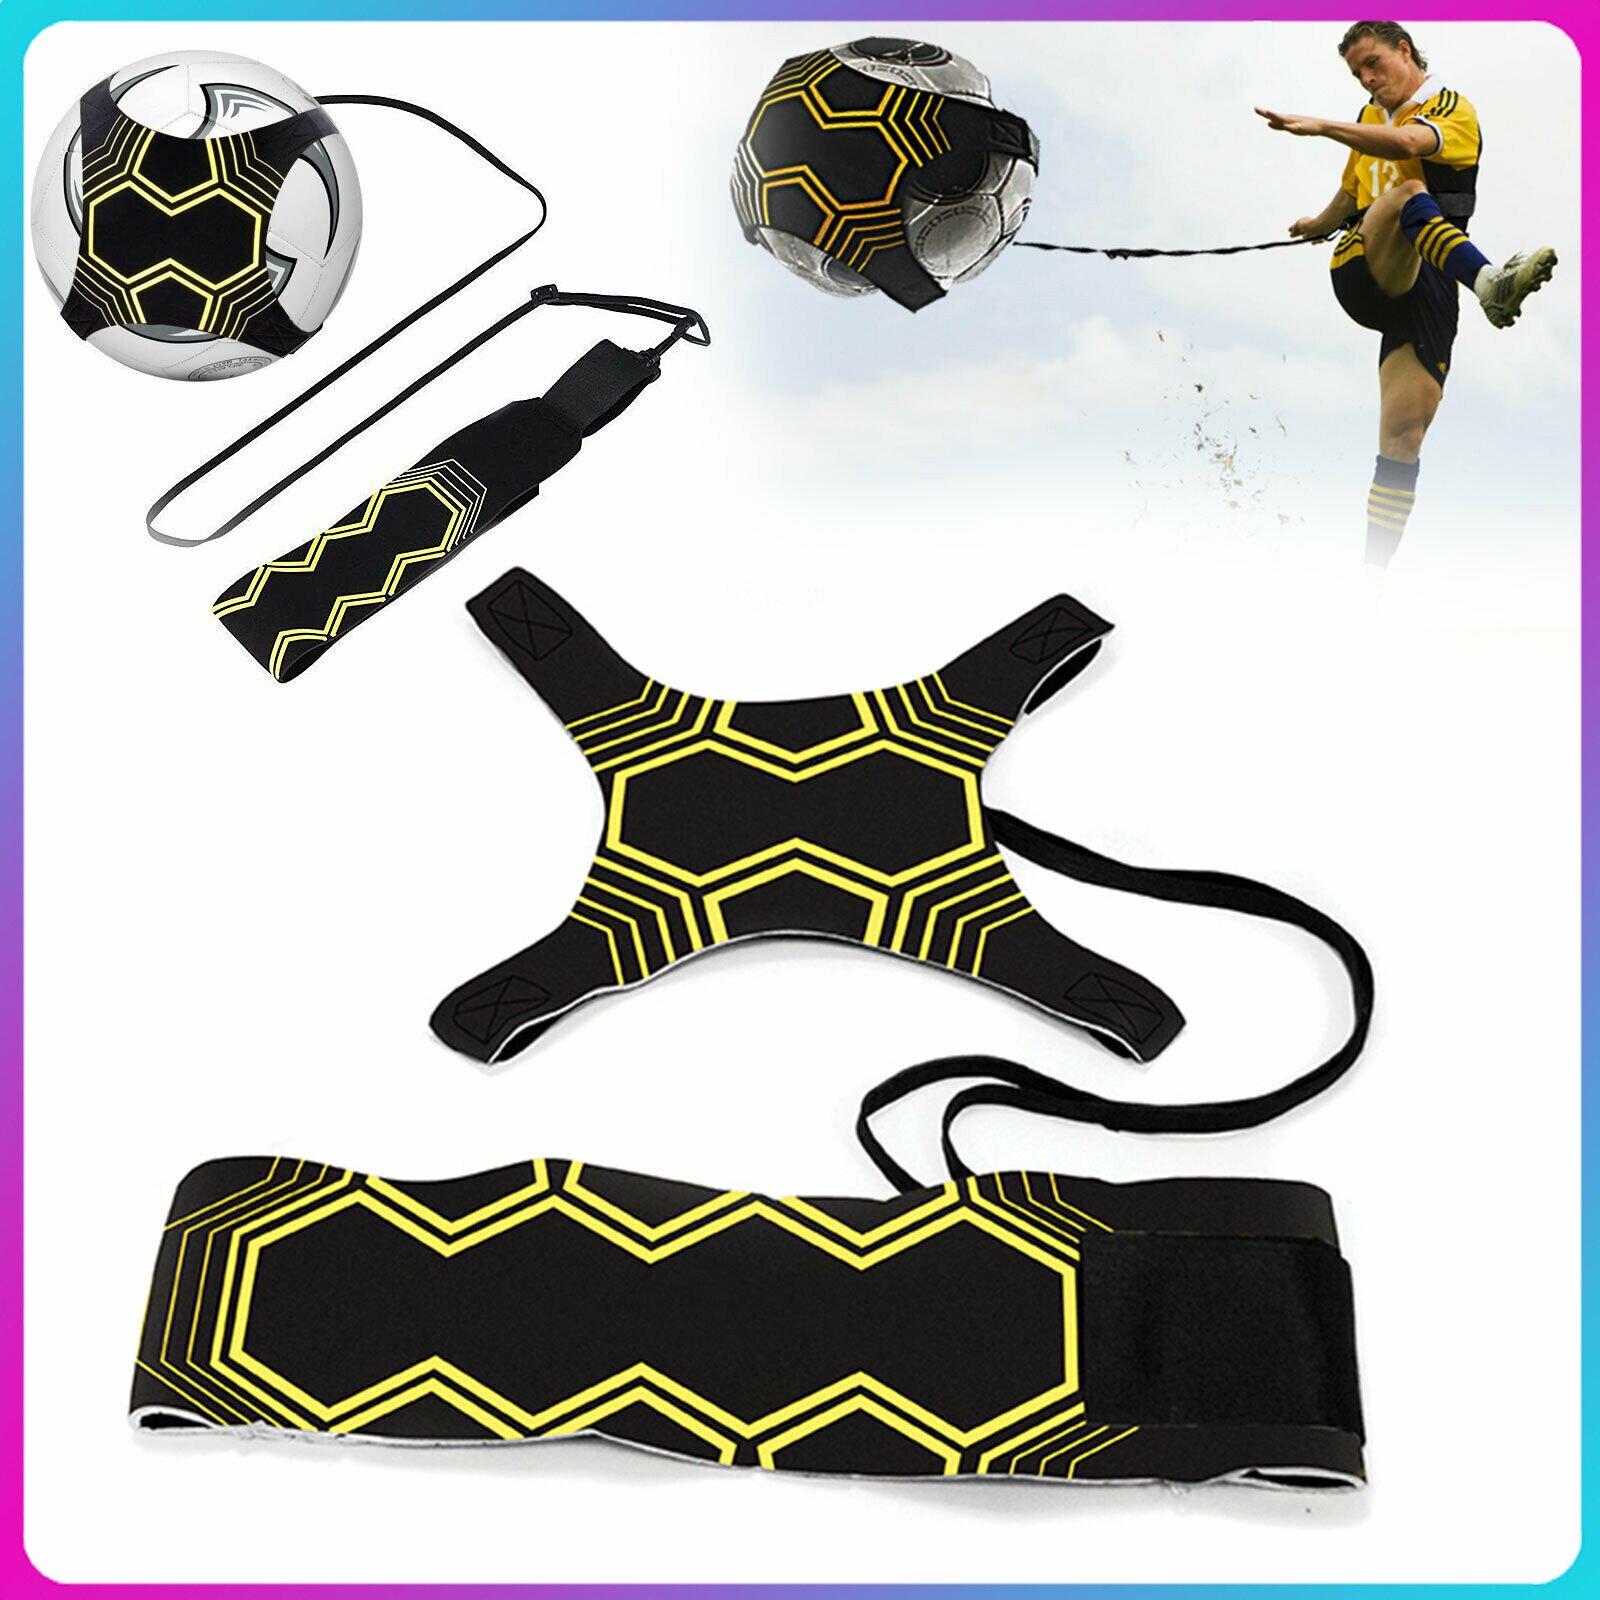 Voetbal Trainer Voetbal Kick Gooi Solo Praktijk Training Aid Controle Vaardigheden Verstelbare Apparatuur Bal Zakken Gift